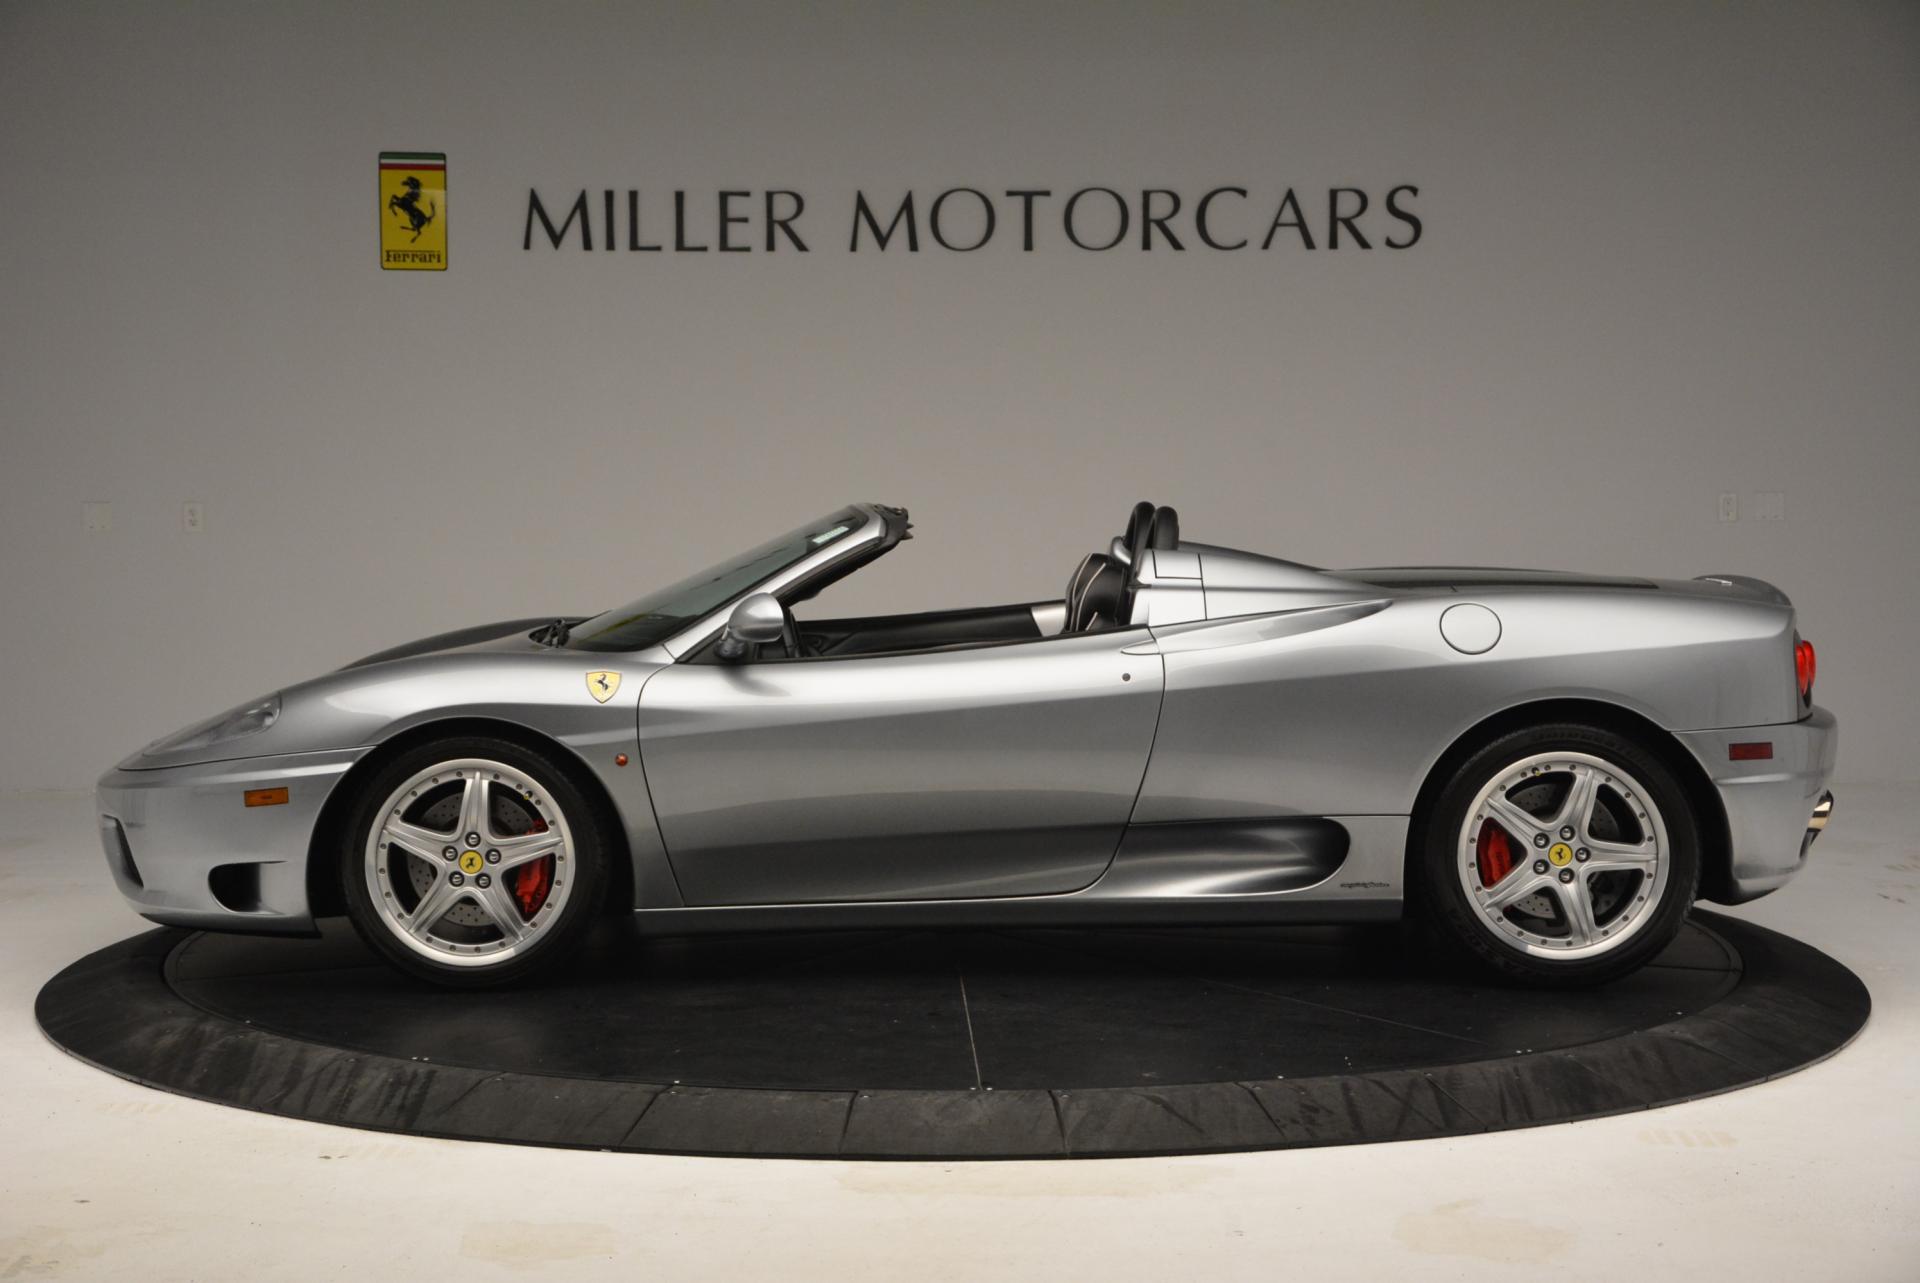 Used 2004 Ferrari 360 Spider 6-Speed Manual  For Sale In Greenwich, CT. Alfa Romeo of Greenwich, 4317 138_p3